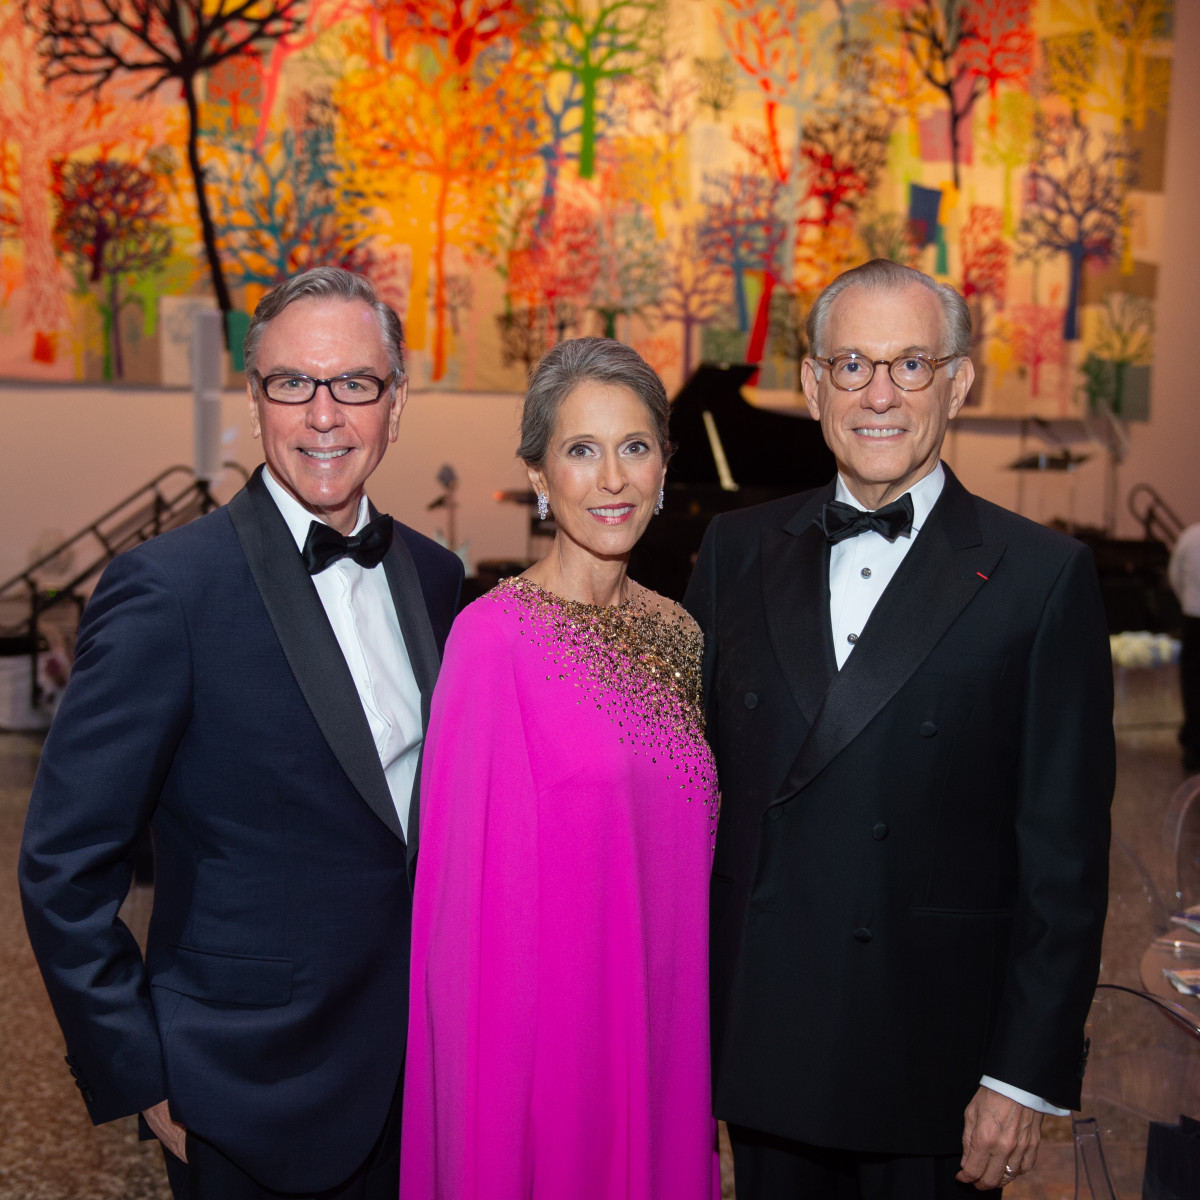 MFAH Grand Gala Ball 2019 Ball Chairs Bill and Susanne Pritchard, Gary Tinterow; Photo by Wilson Parish